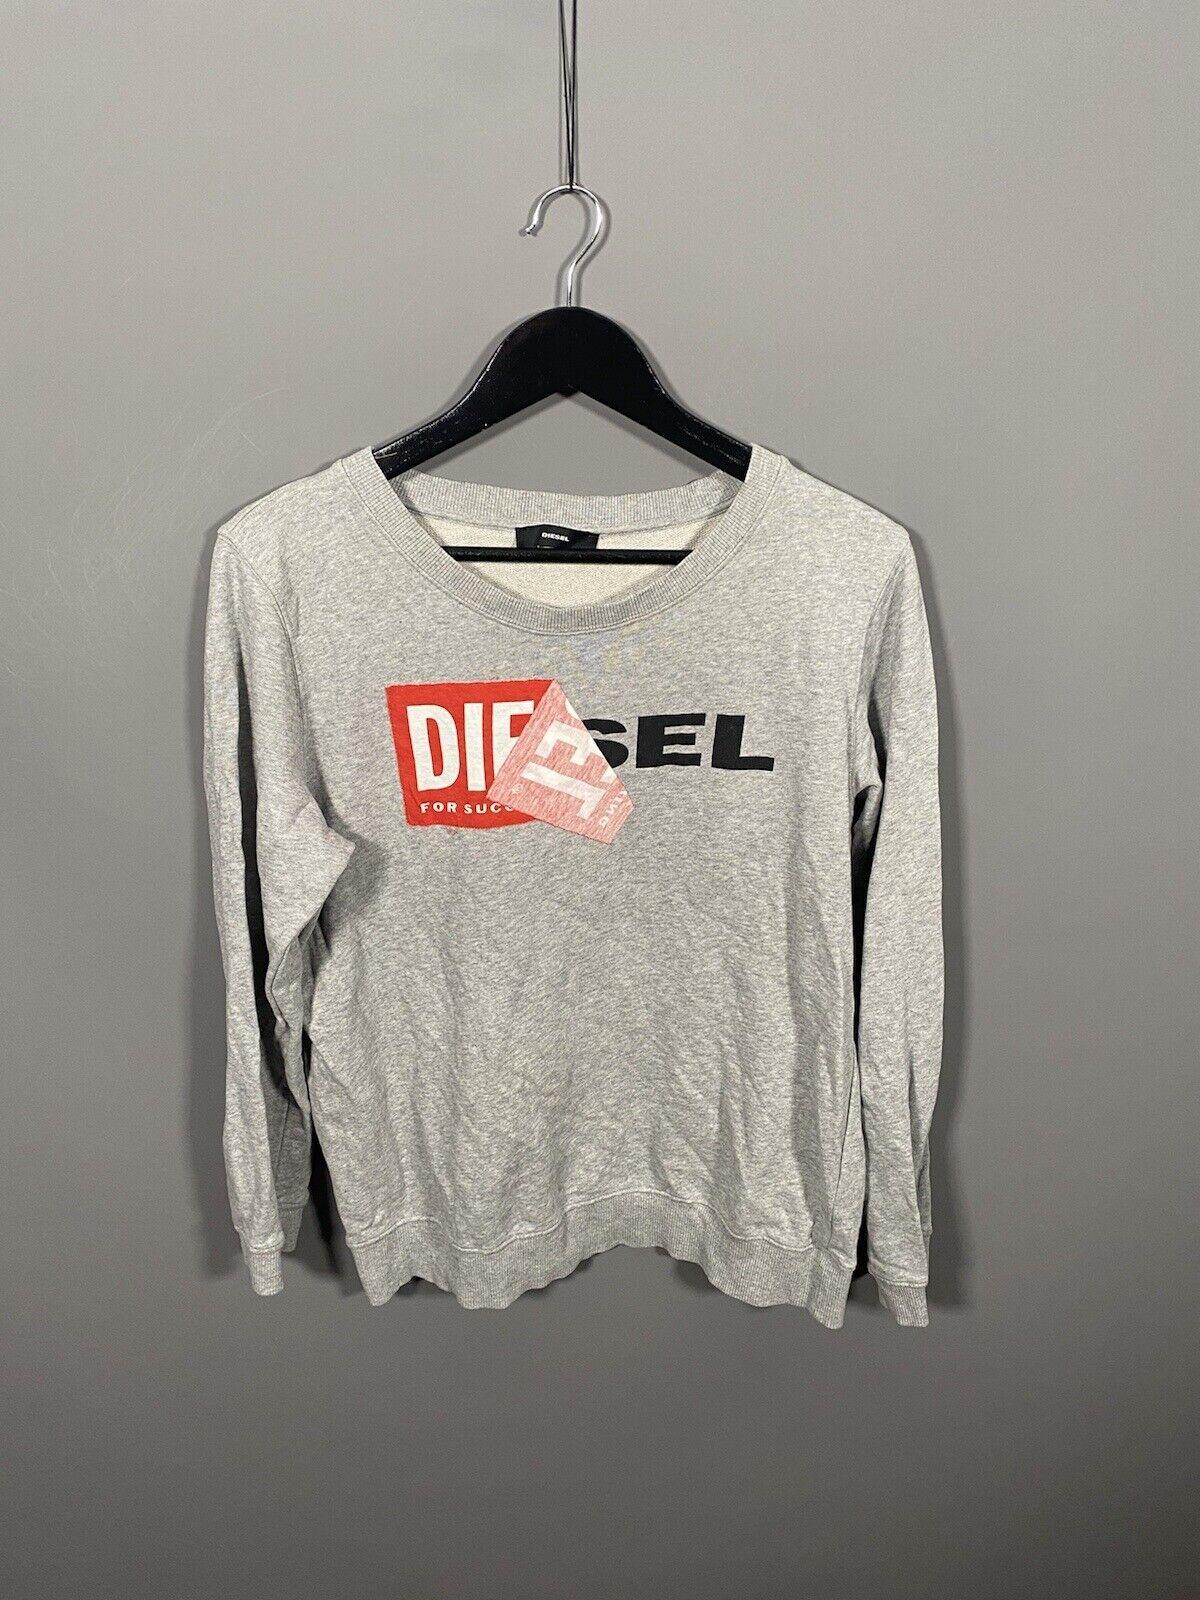 DIESEL Sweatshirt - Size Small - Grey - Great Condition - Men's